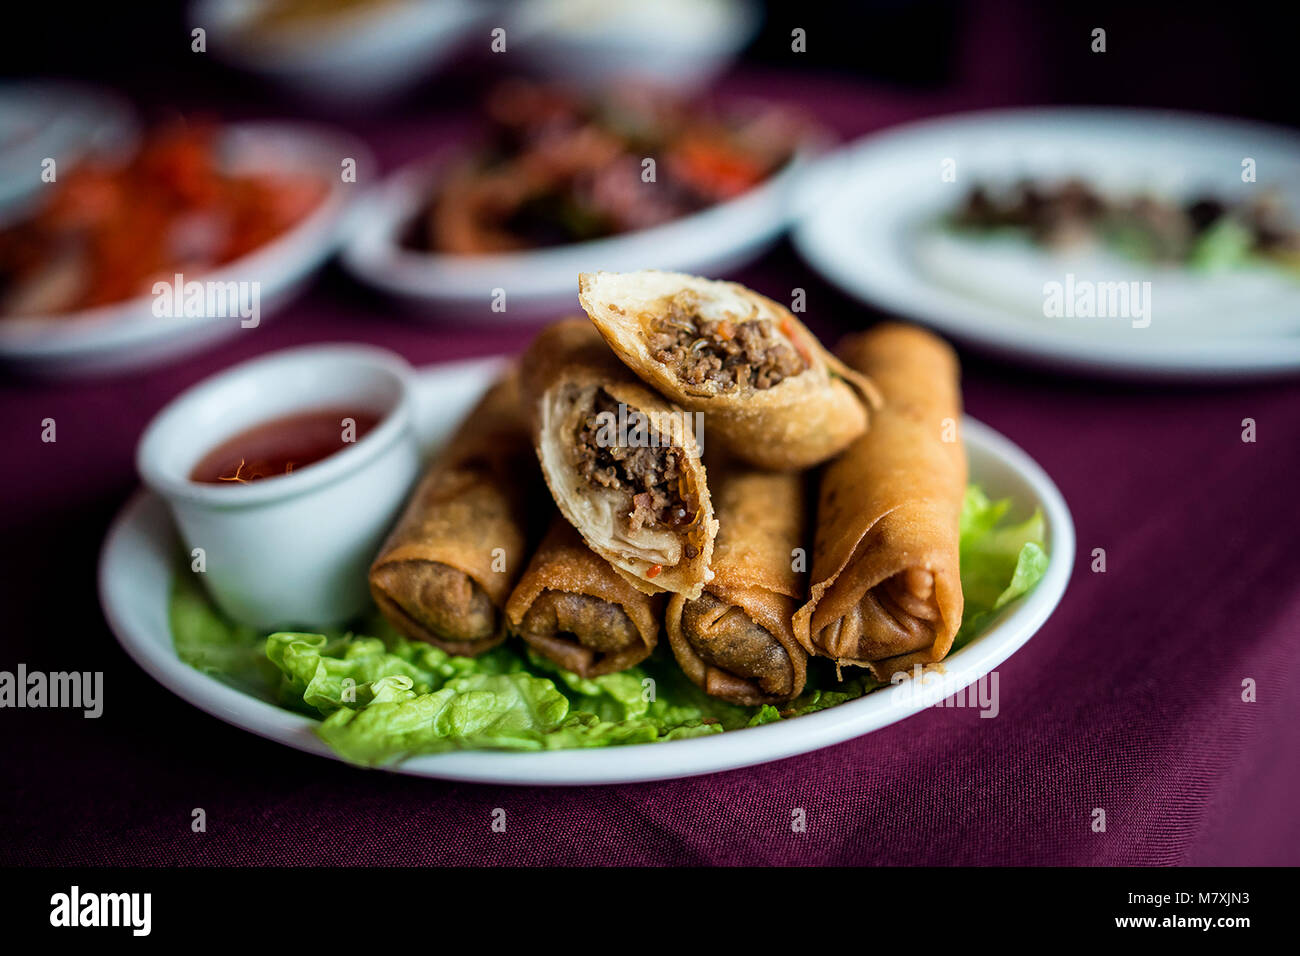 La nourriture de restaurant chinois Photo Stock